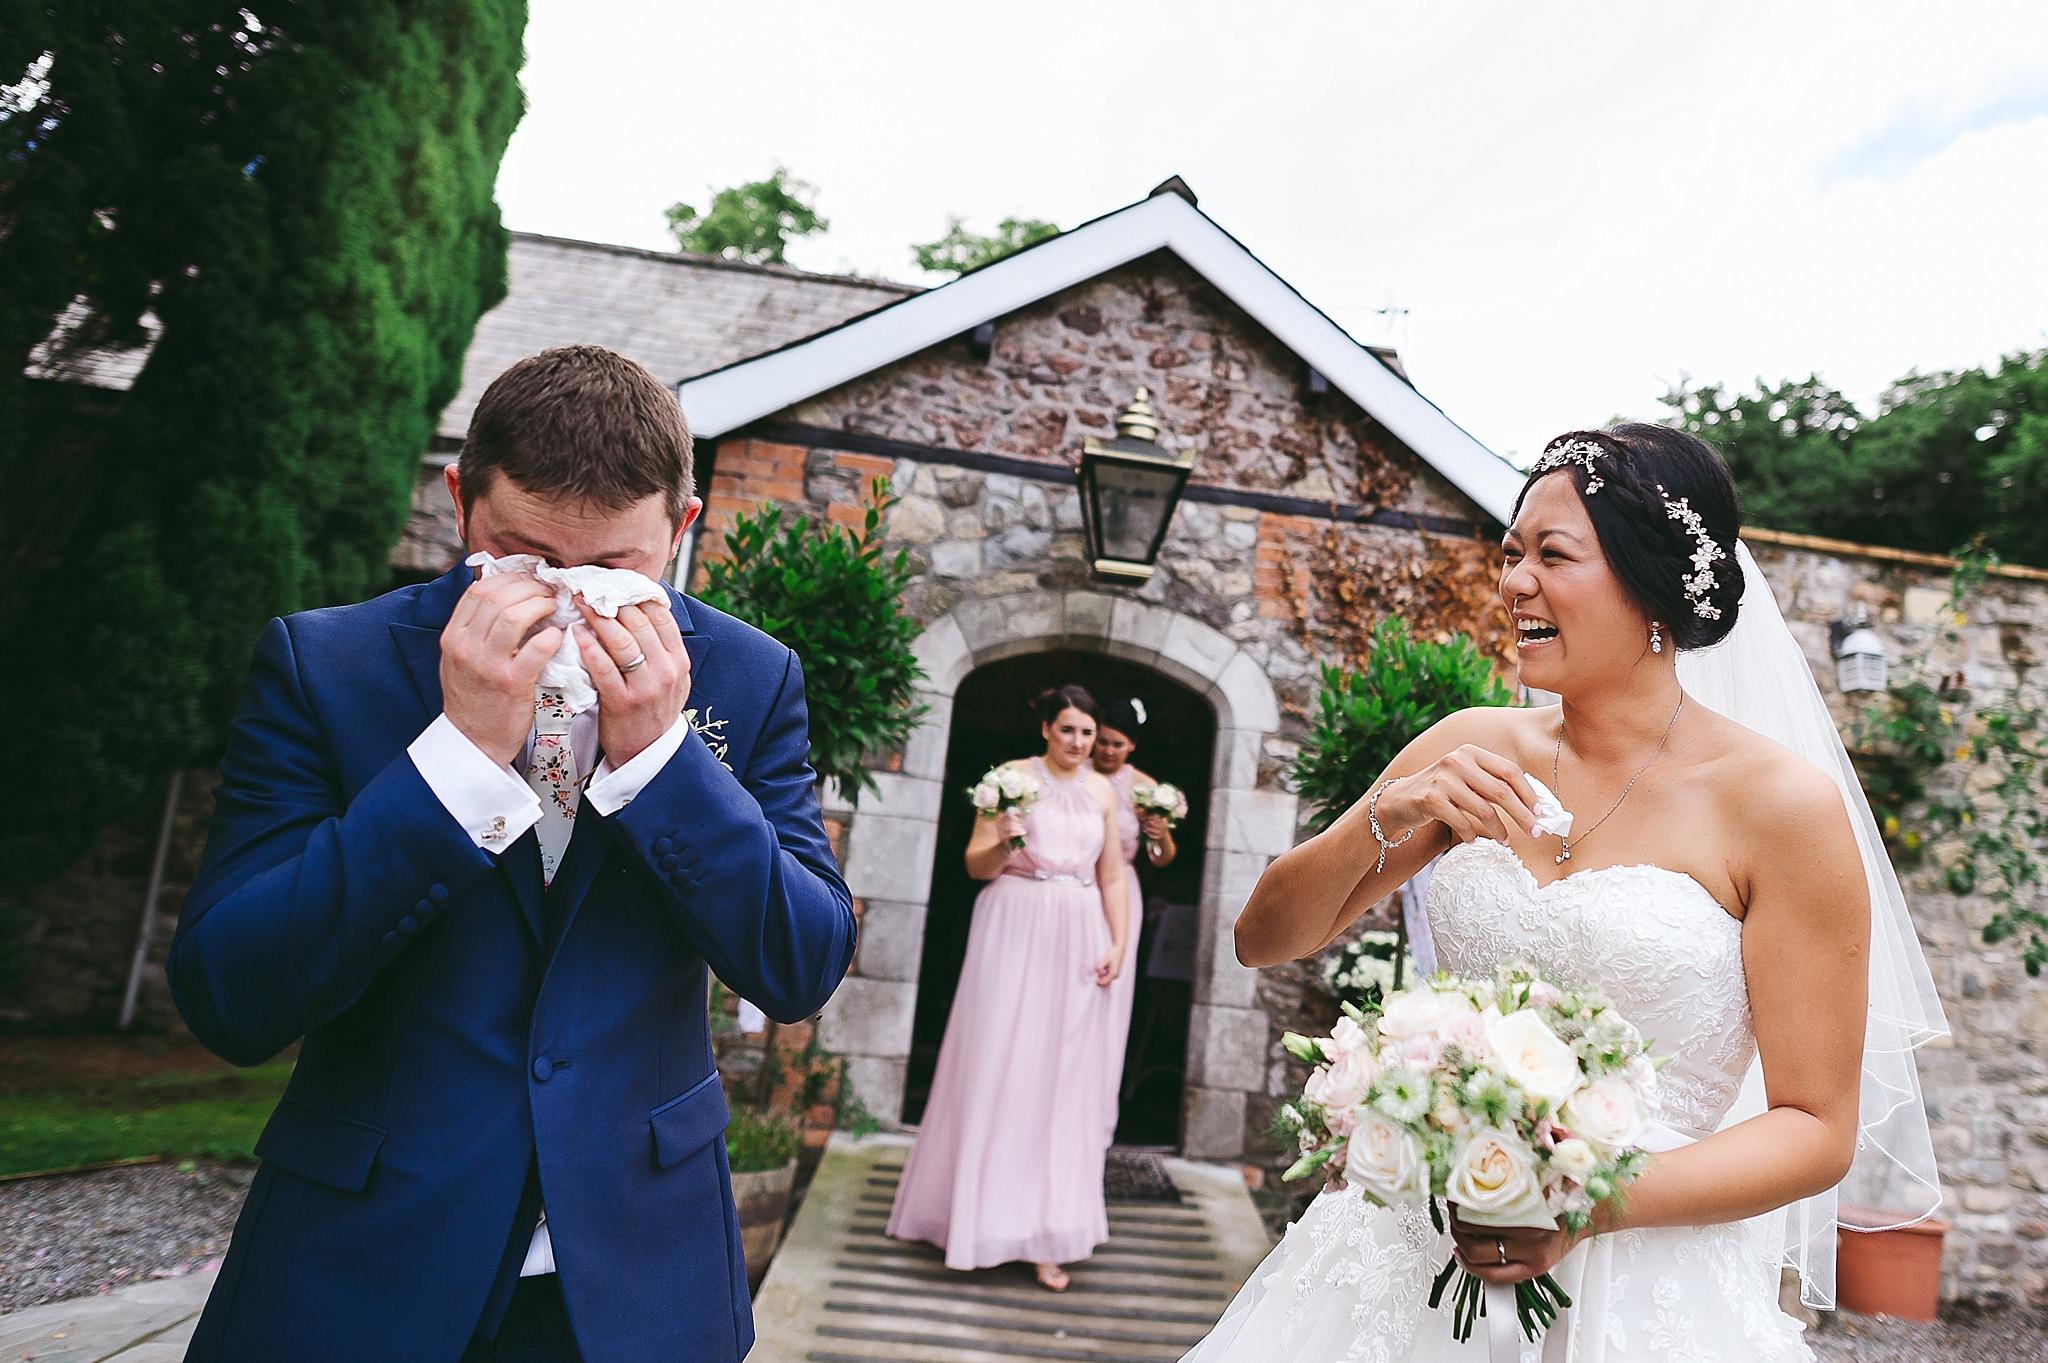 aga-tomaszek-wedding-photographer-cardiff-2016_1060